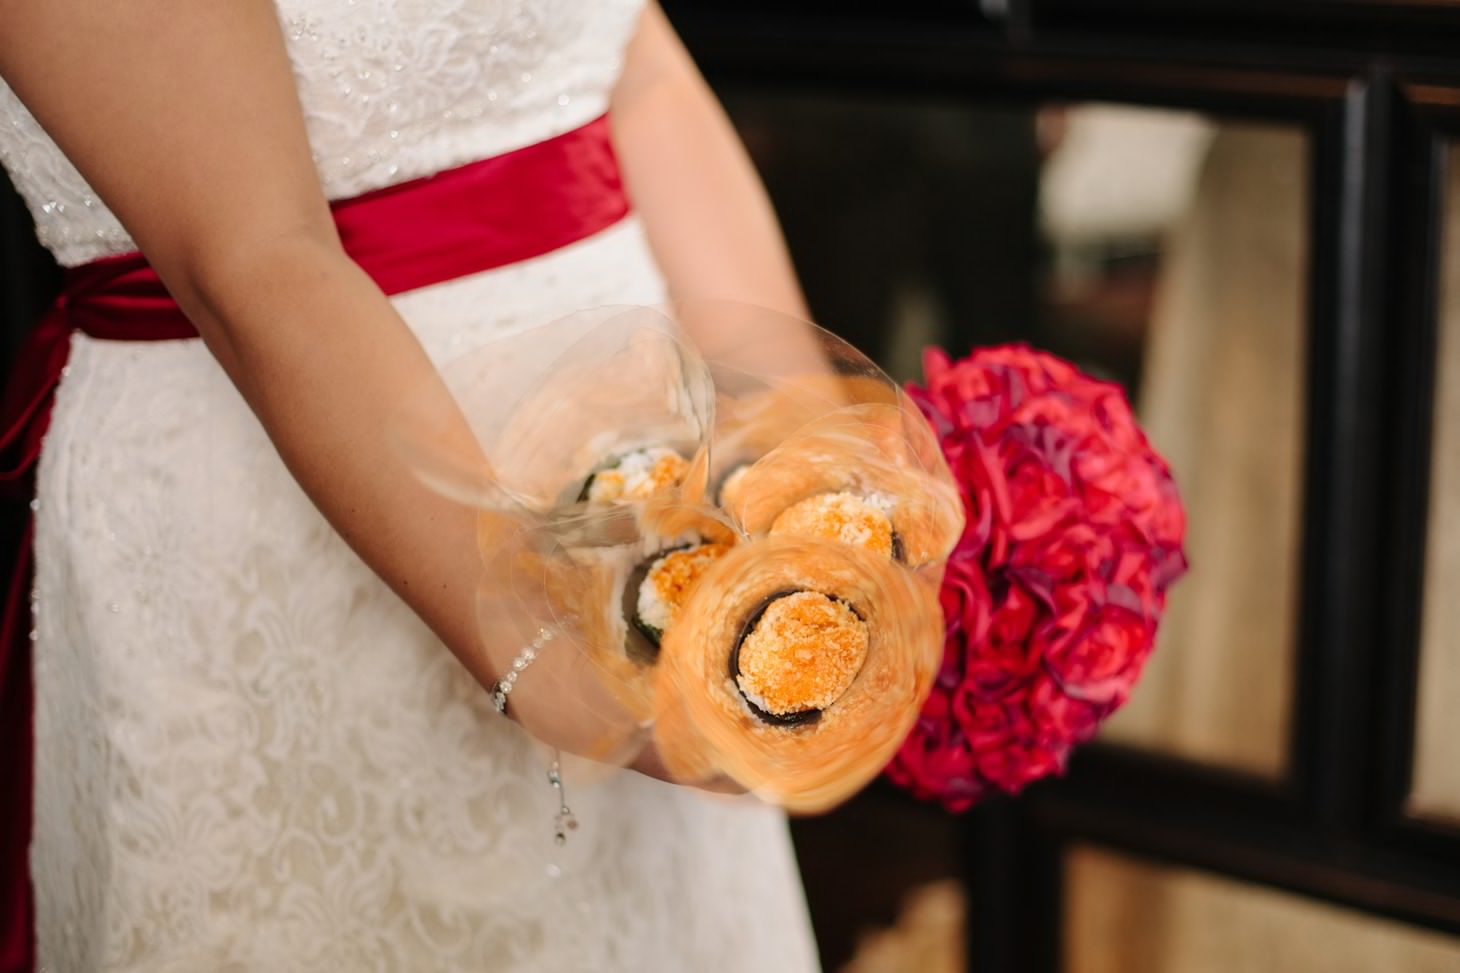 024-nyc-wedding-portrait-photographer-times-square-muse-hotel-winter-wedding-smitten-chickens.jpg